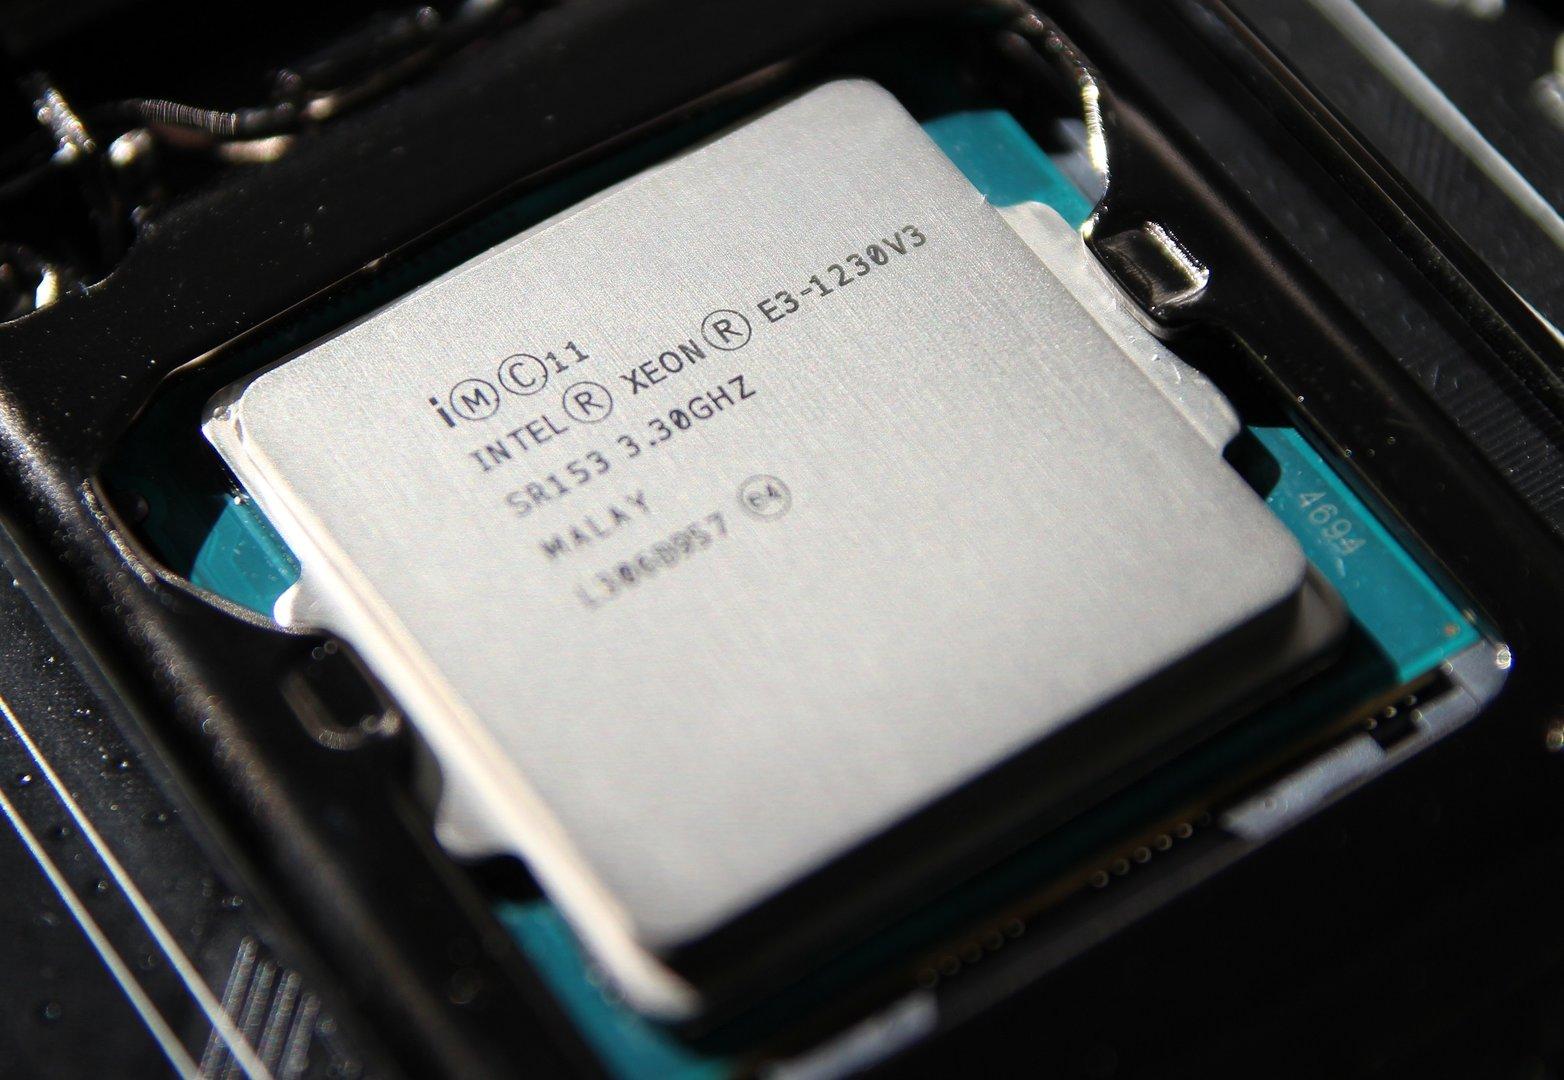 Intel Xeon E3-1230 v3